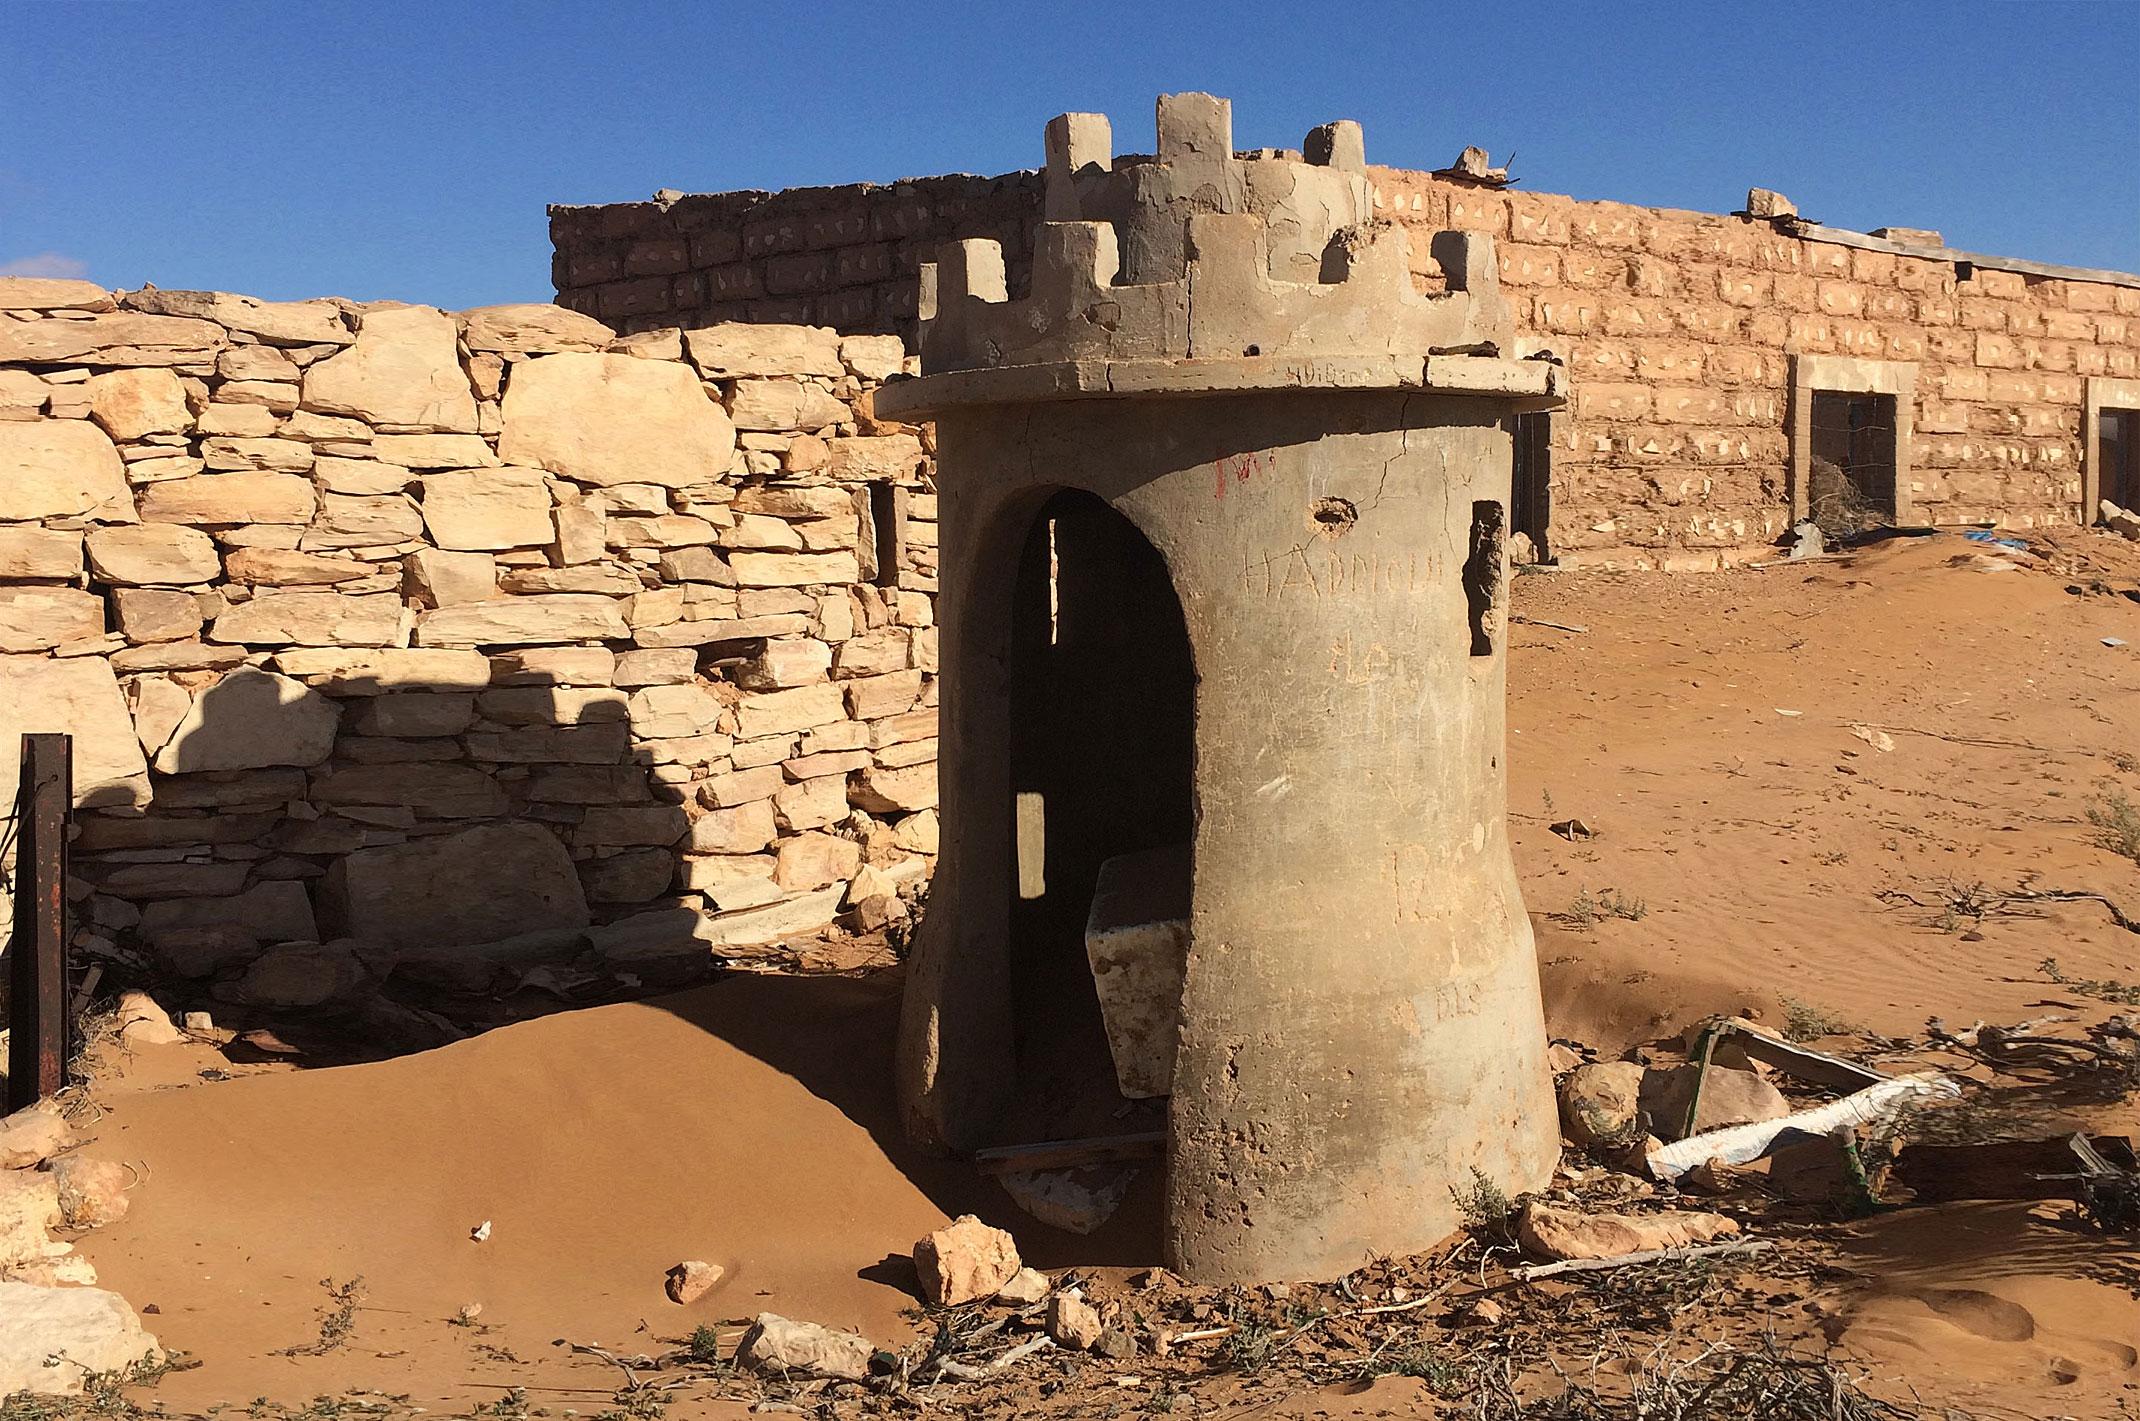 Maroko.Sahara Zachodnia.Stary Fort El-Hagunia